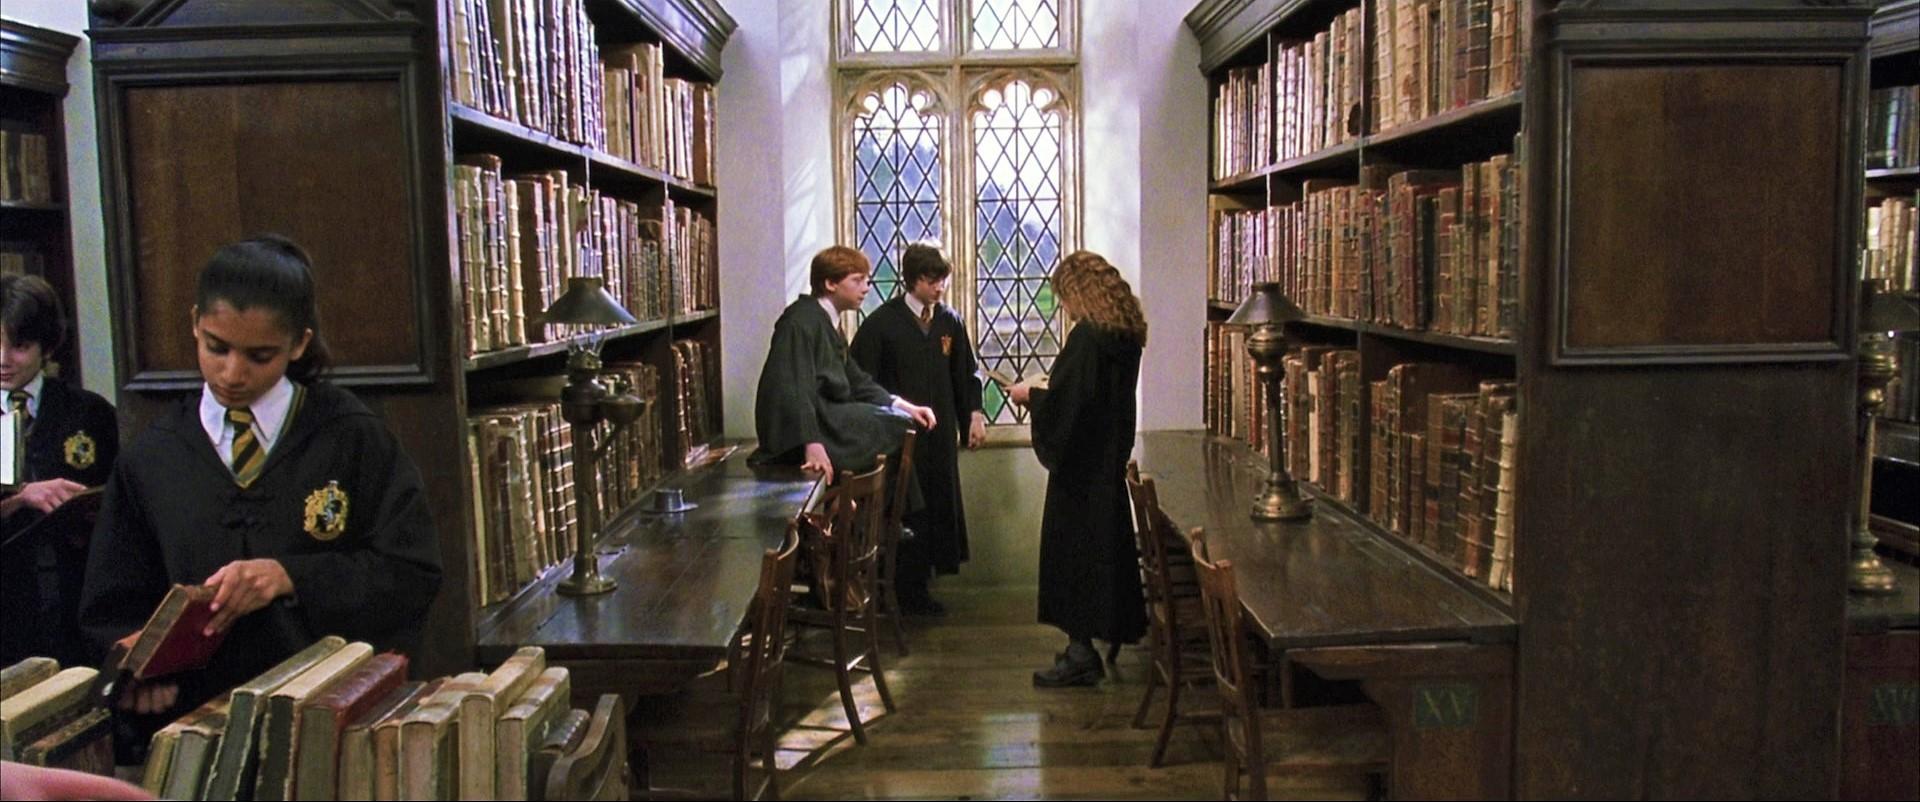 Hogwarts Library Harry Potter Wiki Fandom